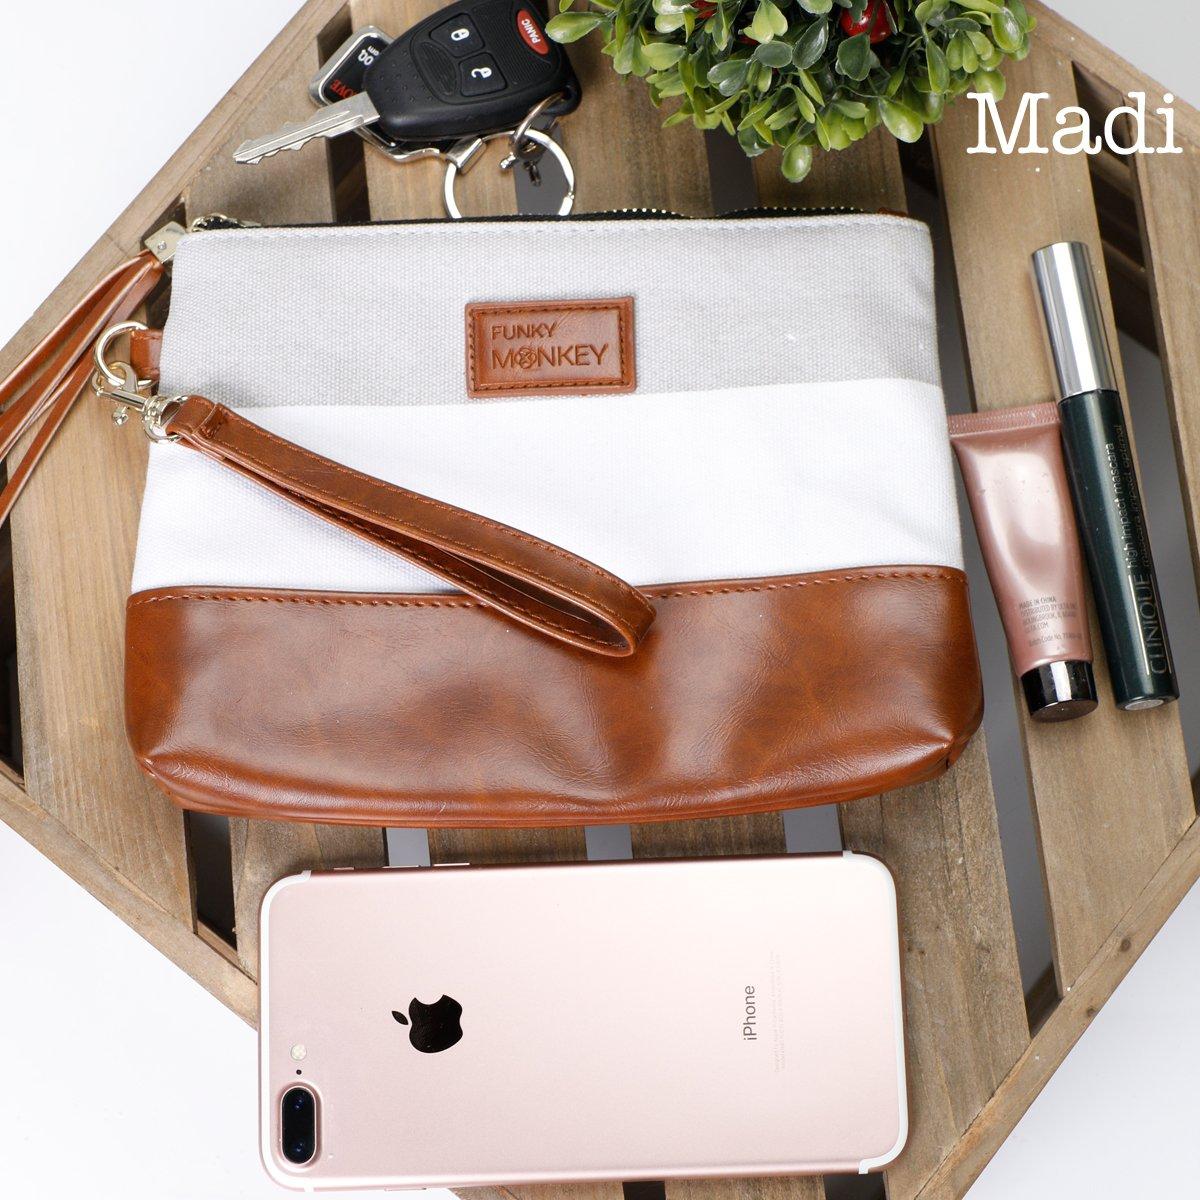 {Madi Collection} Wristlet Wallet Clutch Bag - Phone Purse Handbag - Small, Medium, Large Size - Gray & White Stripe Style, Vegan Bottom Urban- Funky Monkey Fashion (Medium) by Funky Monkey Fashion (Image #3)